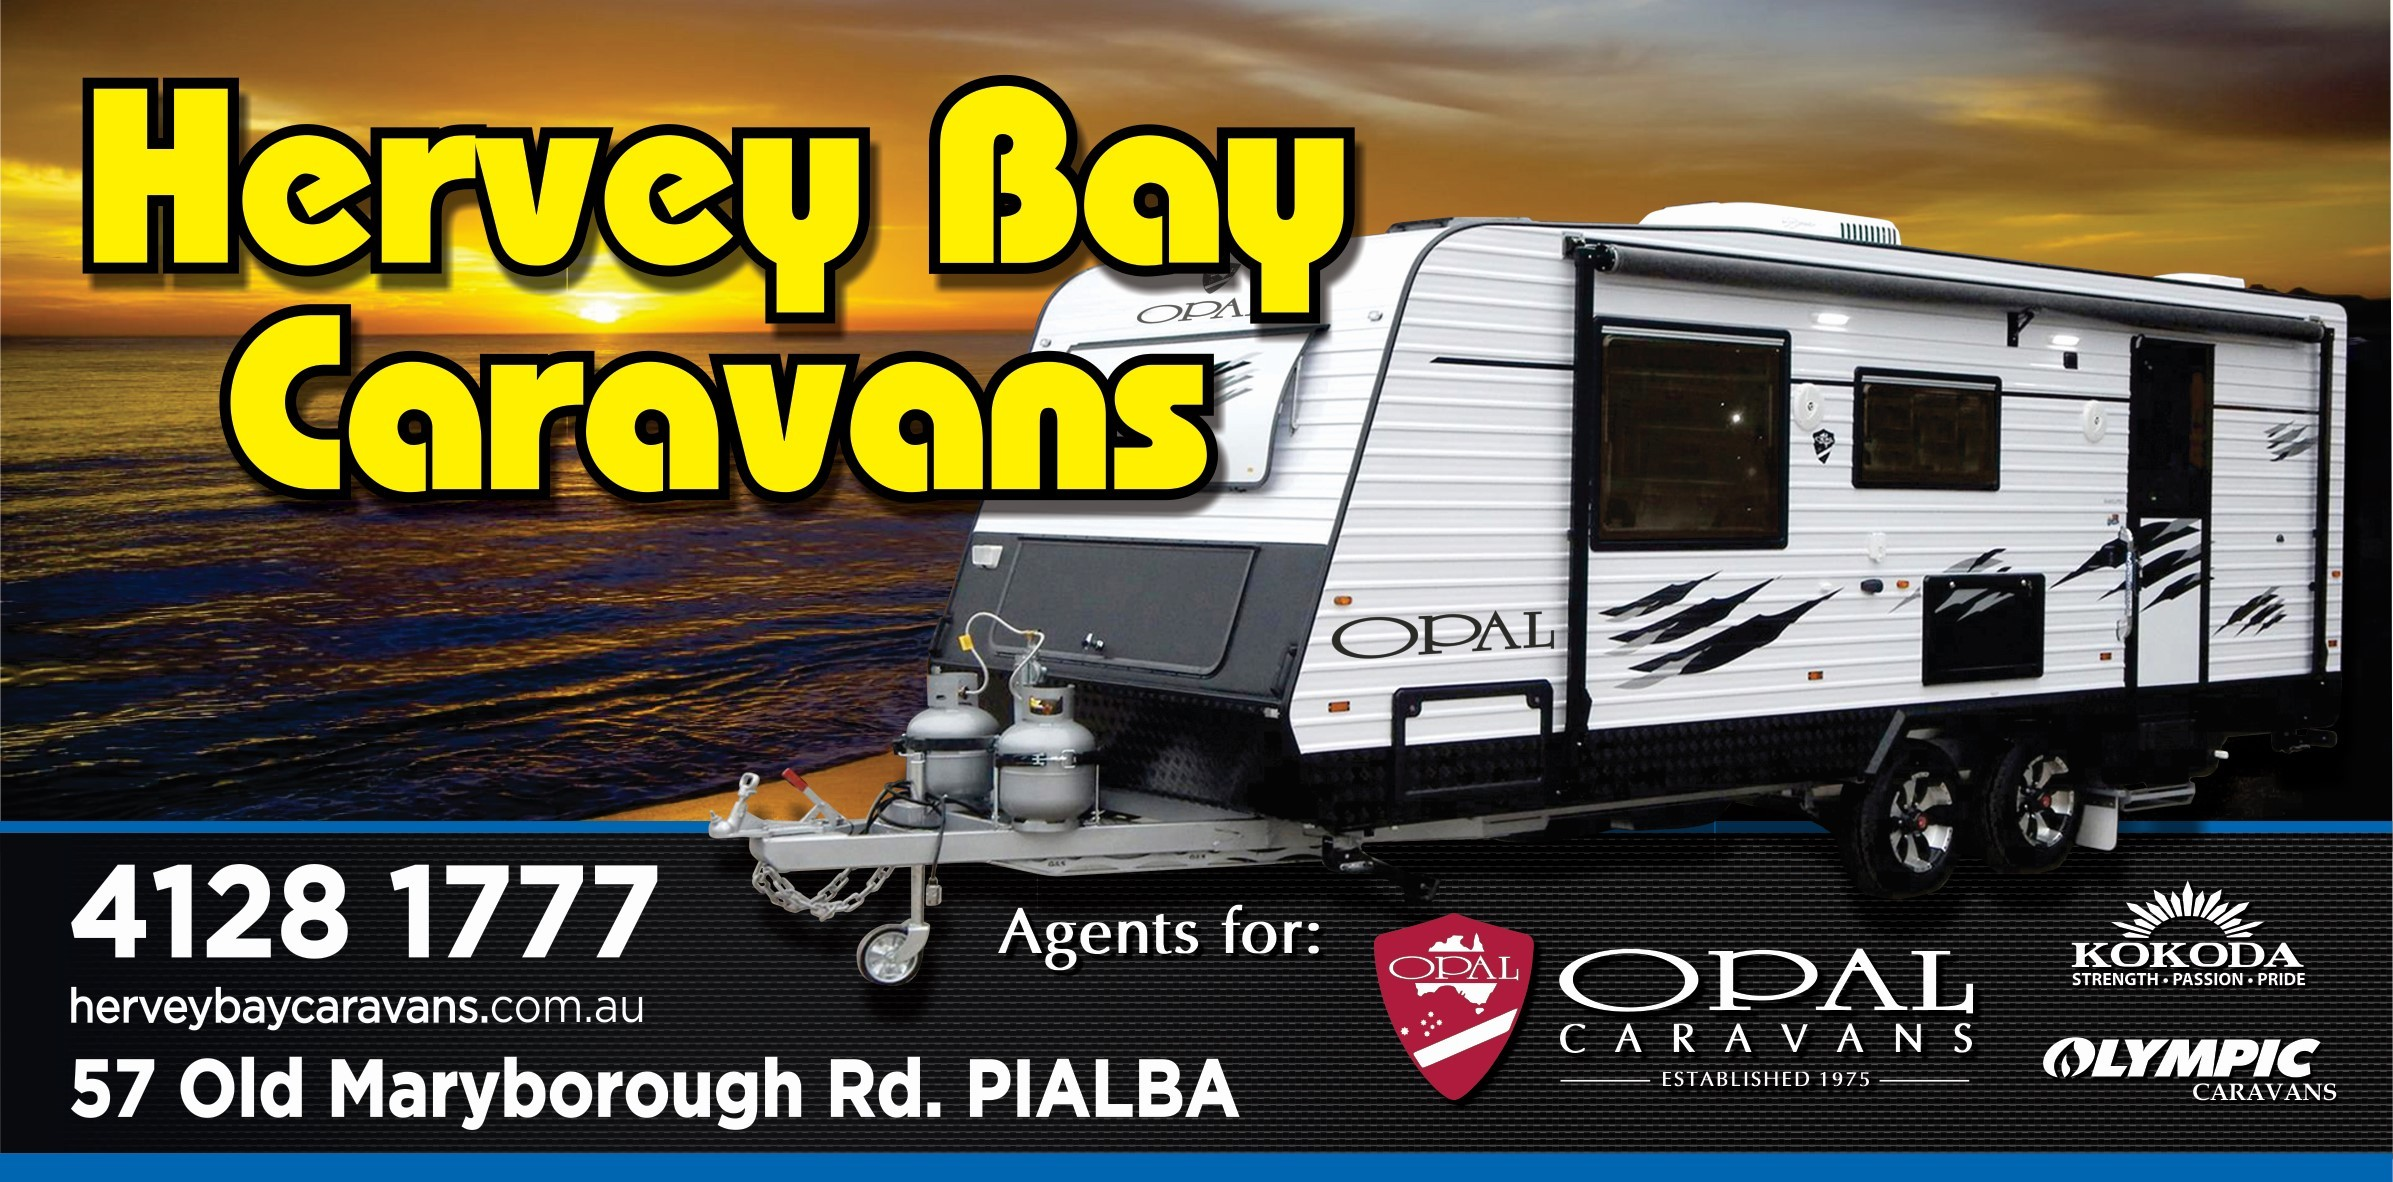 Banner 2 | Harvey Bay Caravans